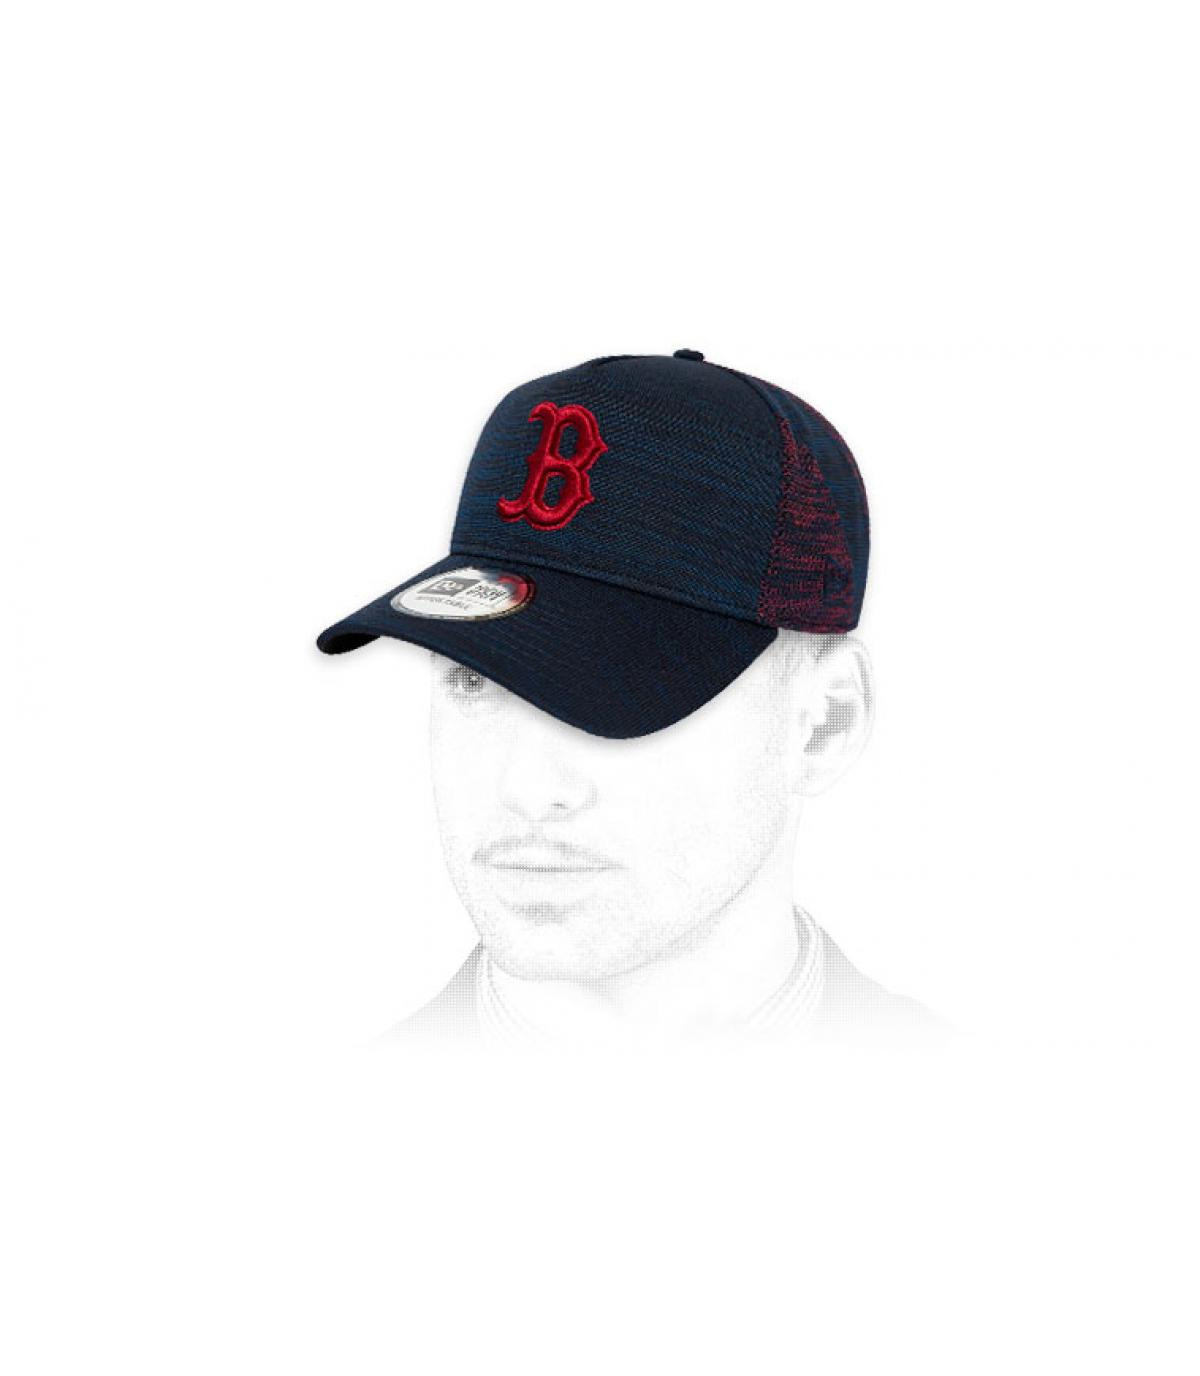 Cap  B blau rot